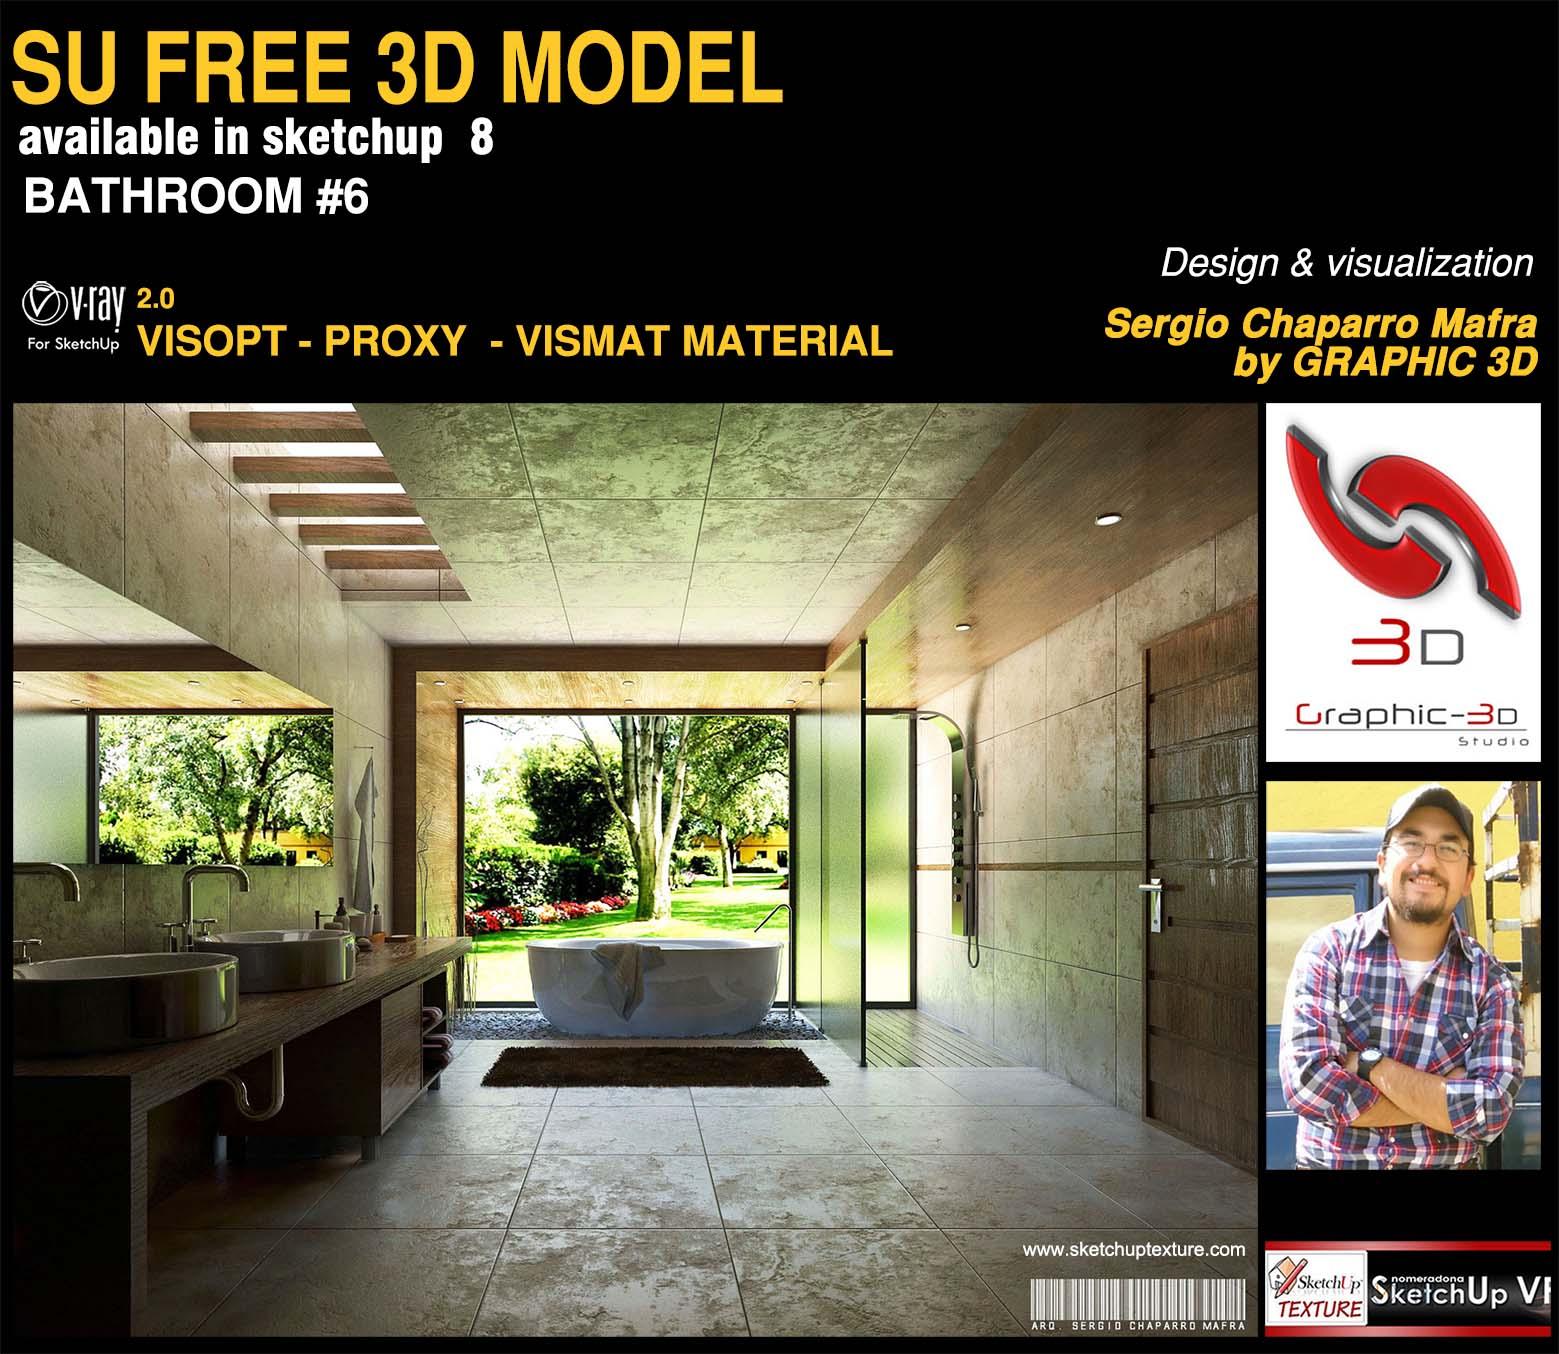 free sketchup 3d model bathroom #6 by Arq Sergio Chaparro Mafra